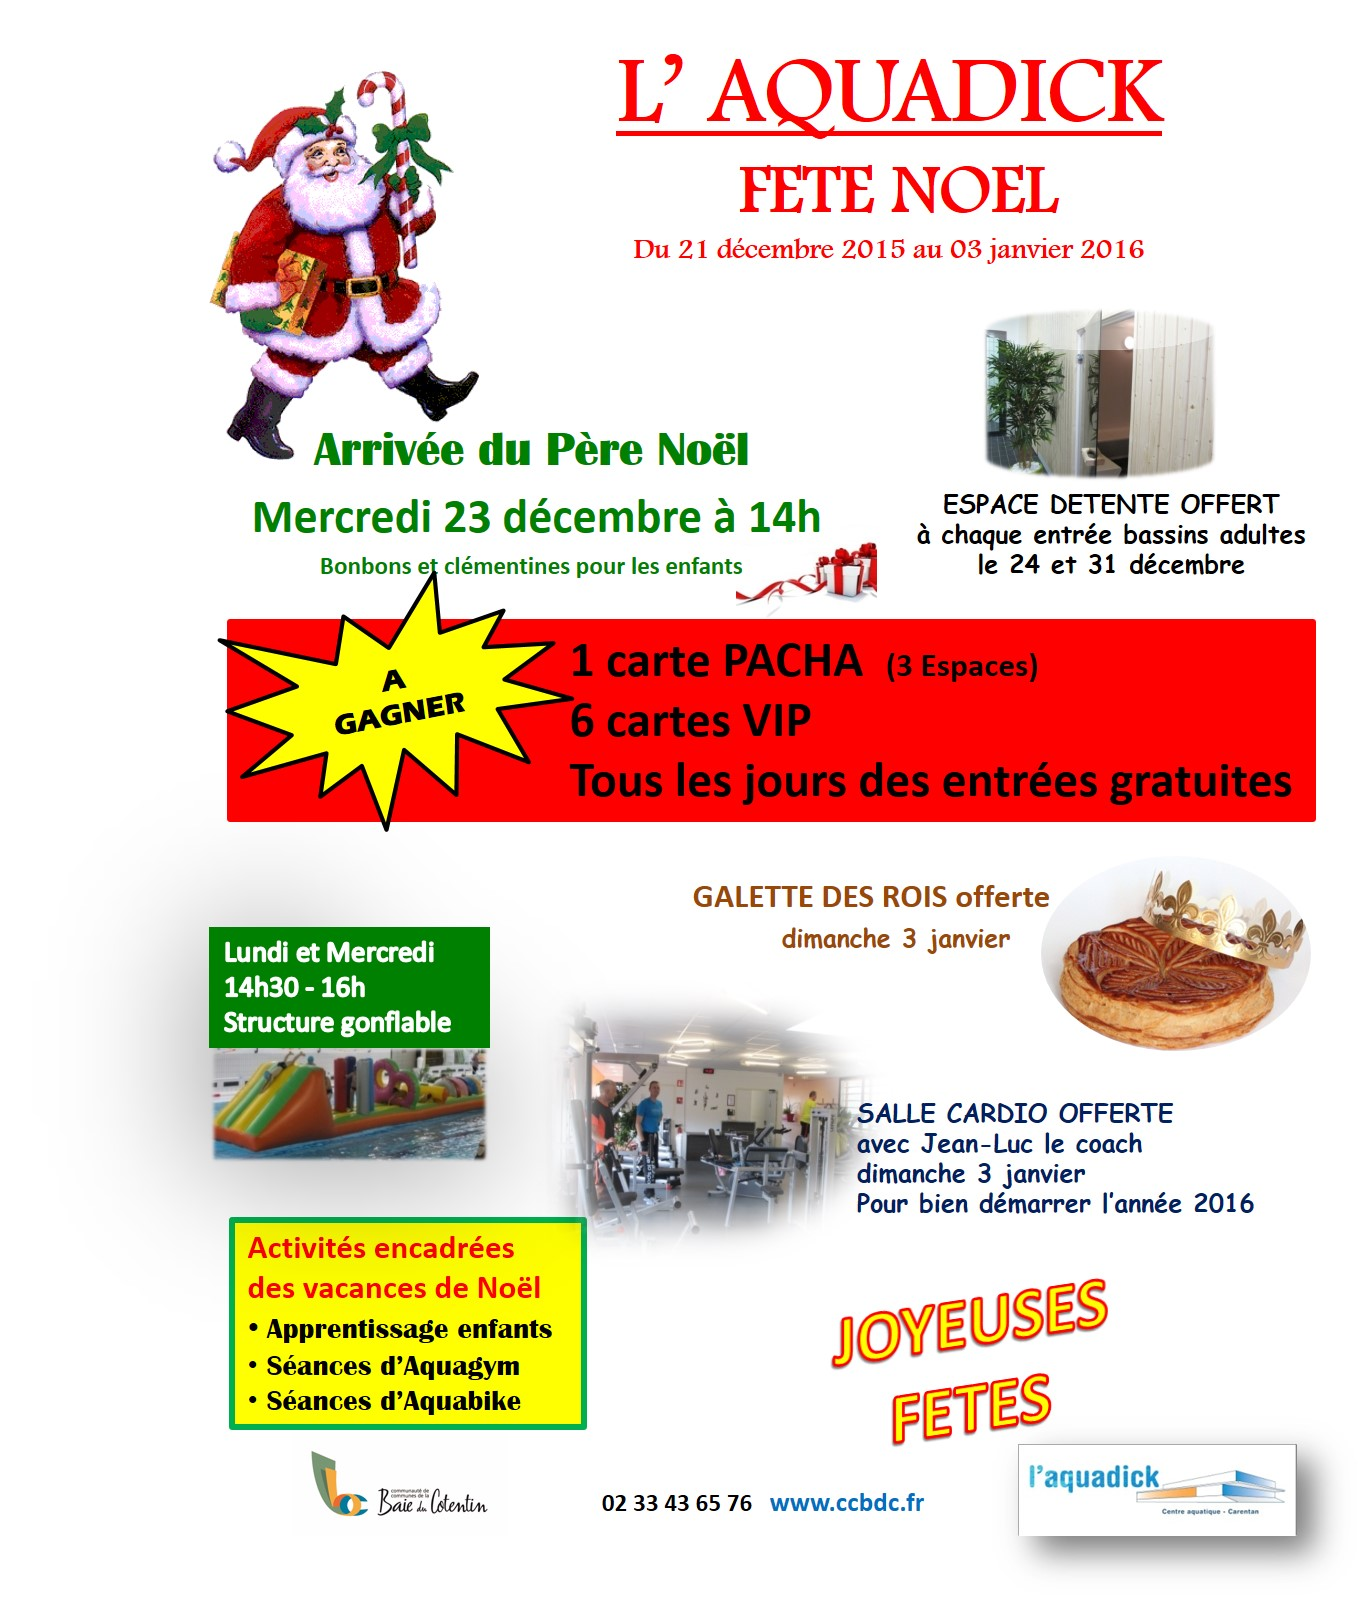 Noël 2015 - Aquadick